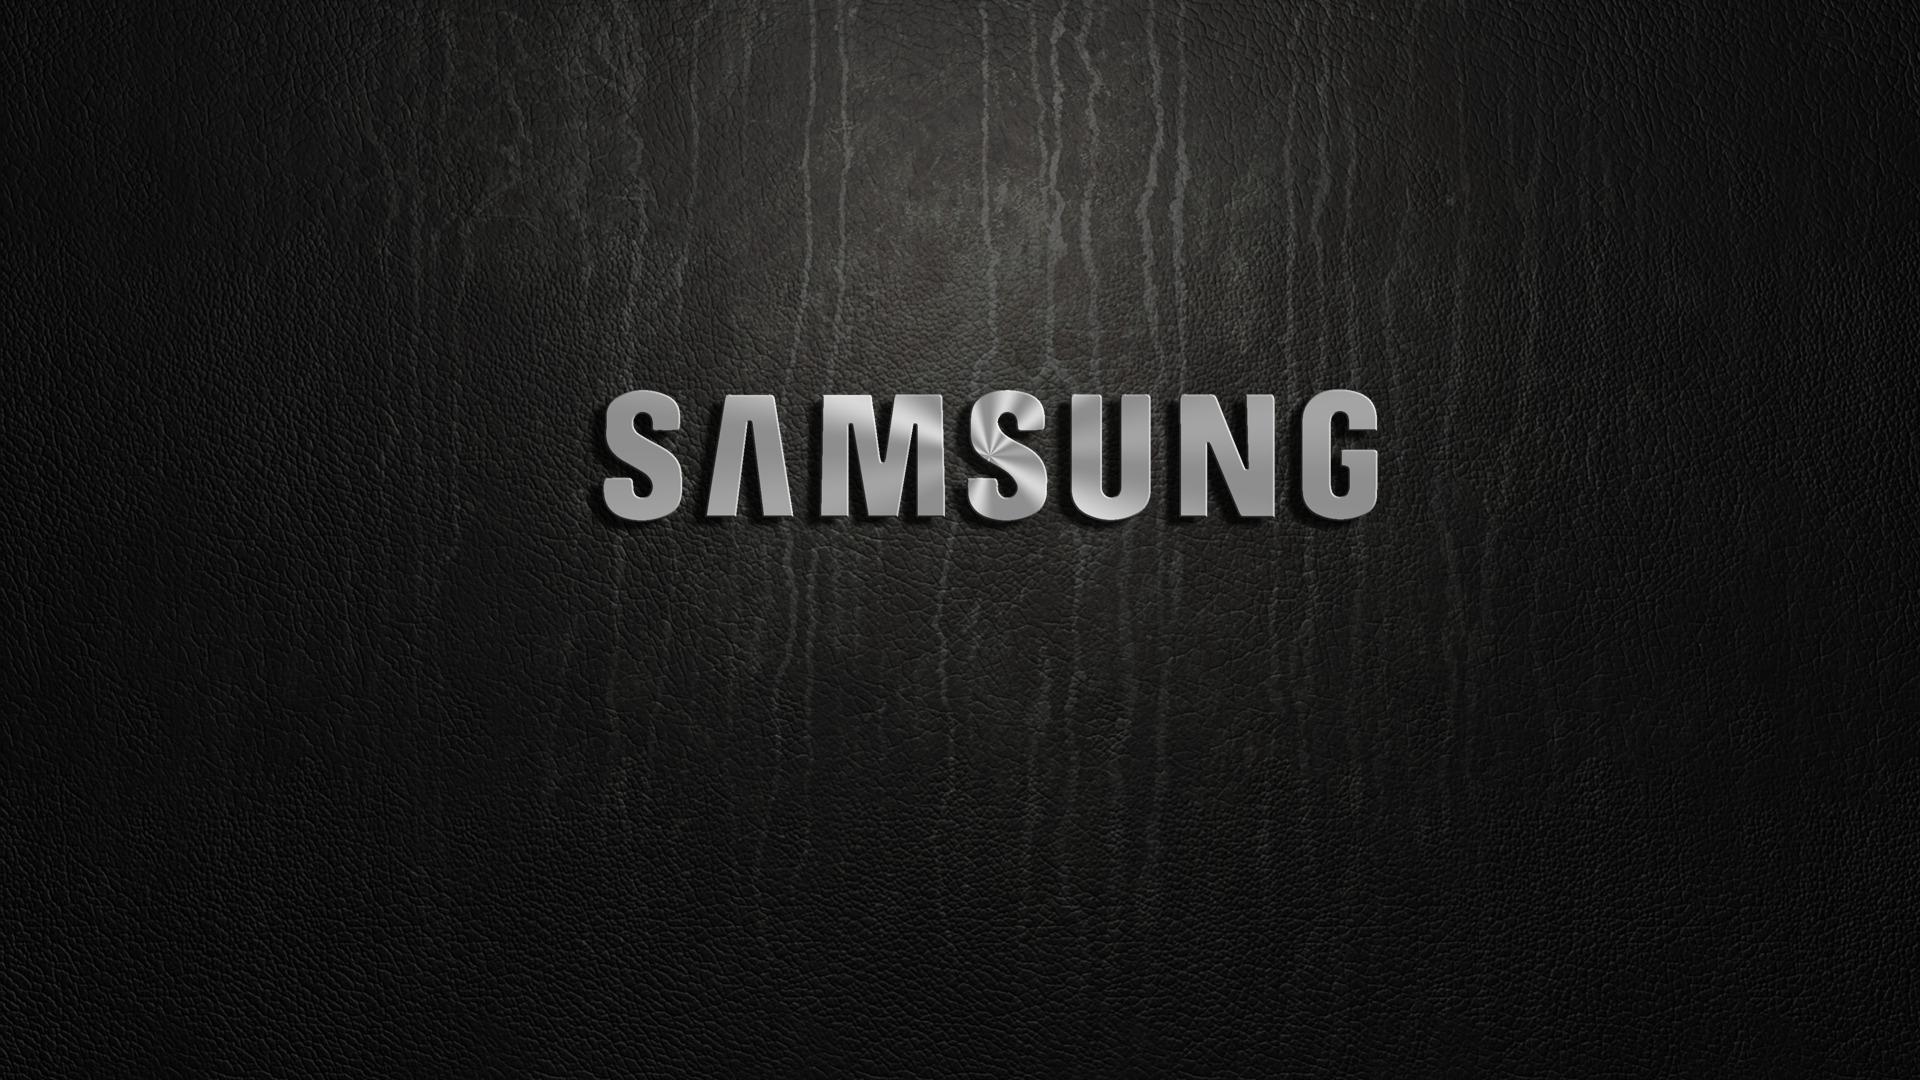 Download Wallpaper samsung silver logo section hi tech 1920x1080